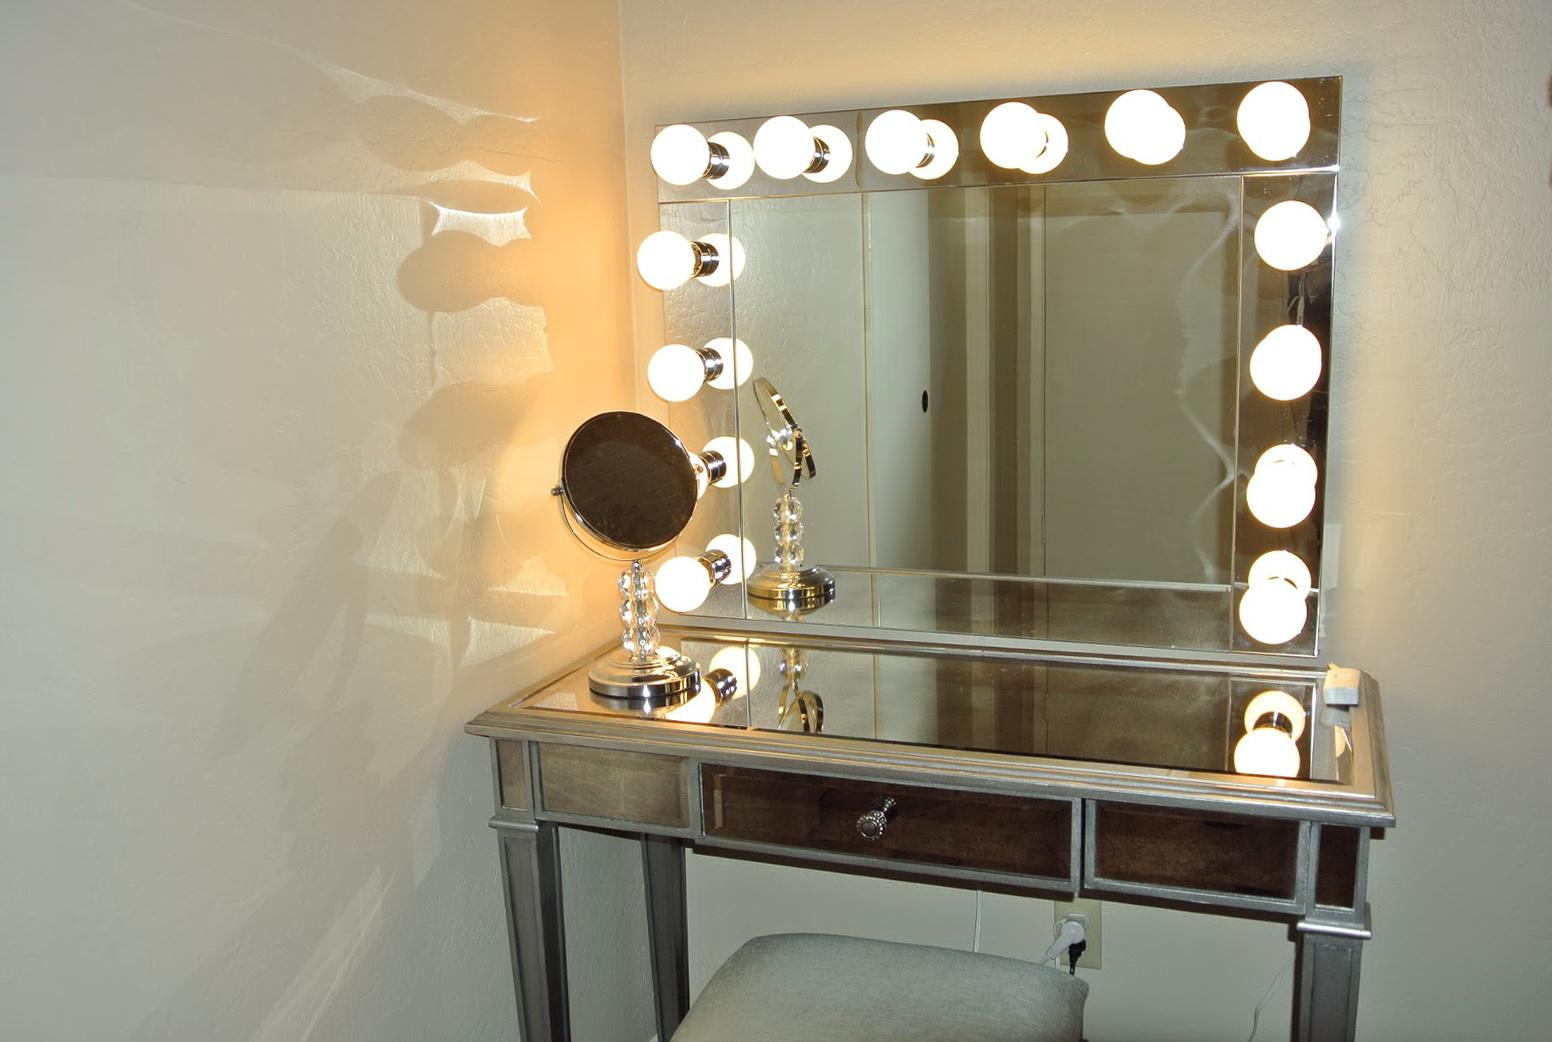 Hollywood Vanity Mirror With Lights Australia